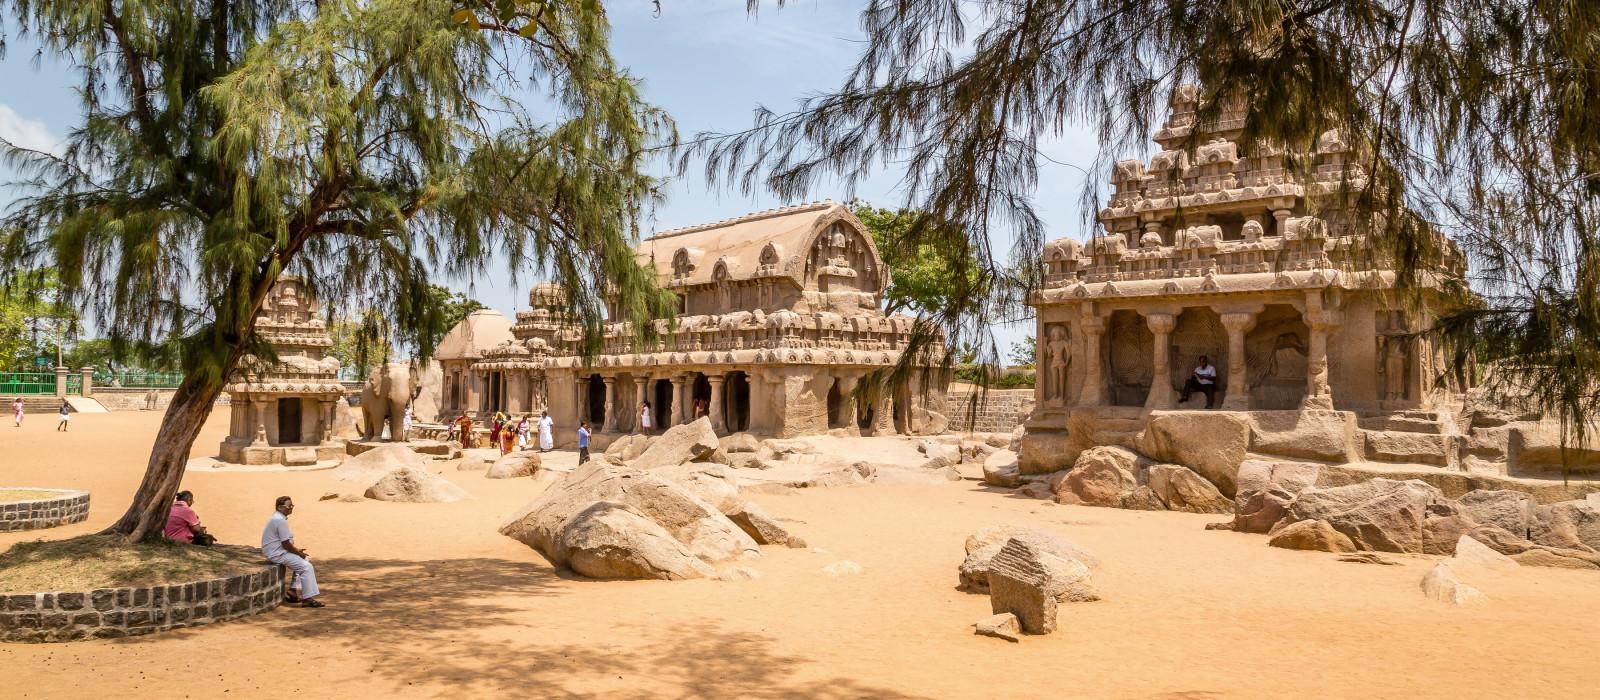 Fünf Rathaus in Mahabalipuram, Tamil Nadu, Indien